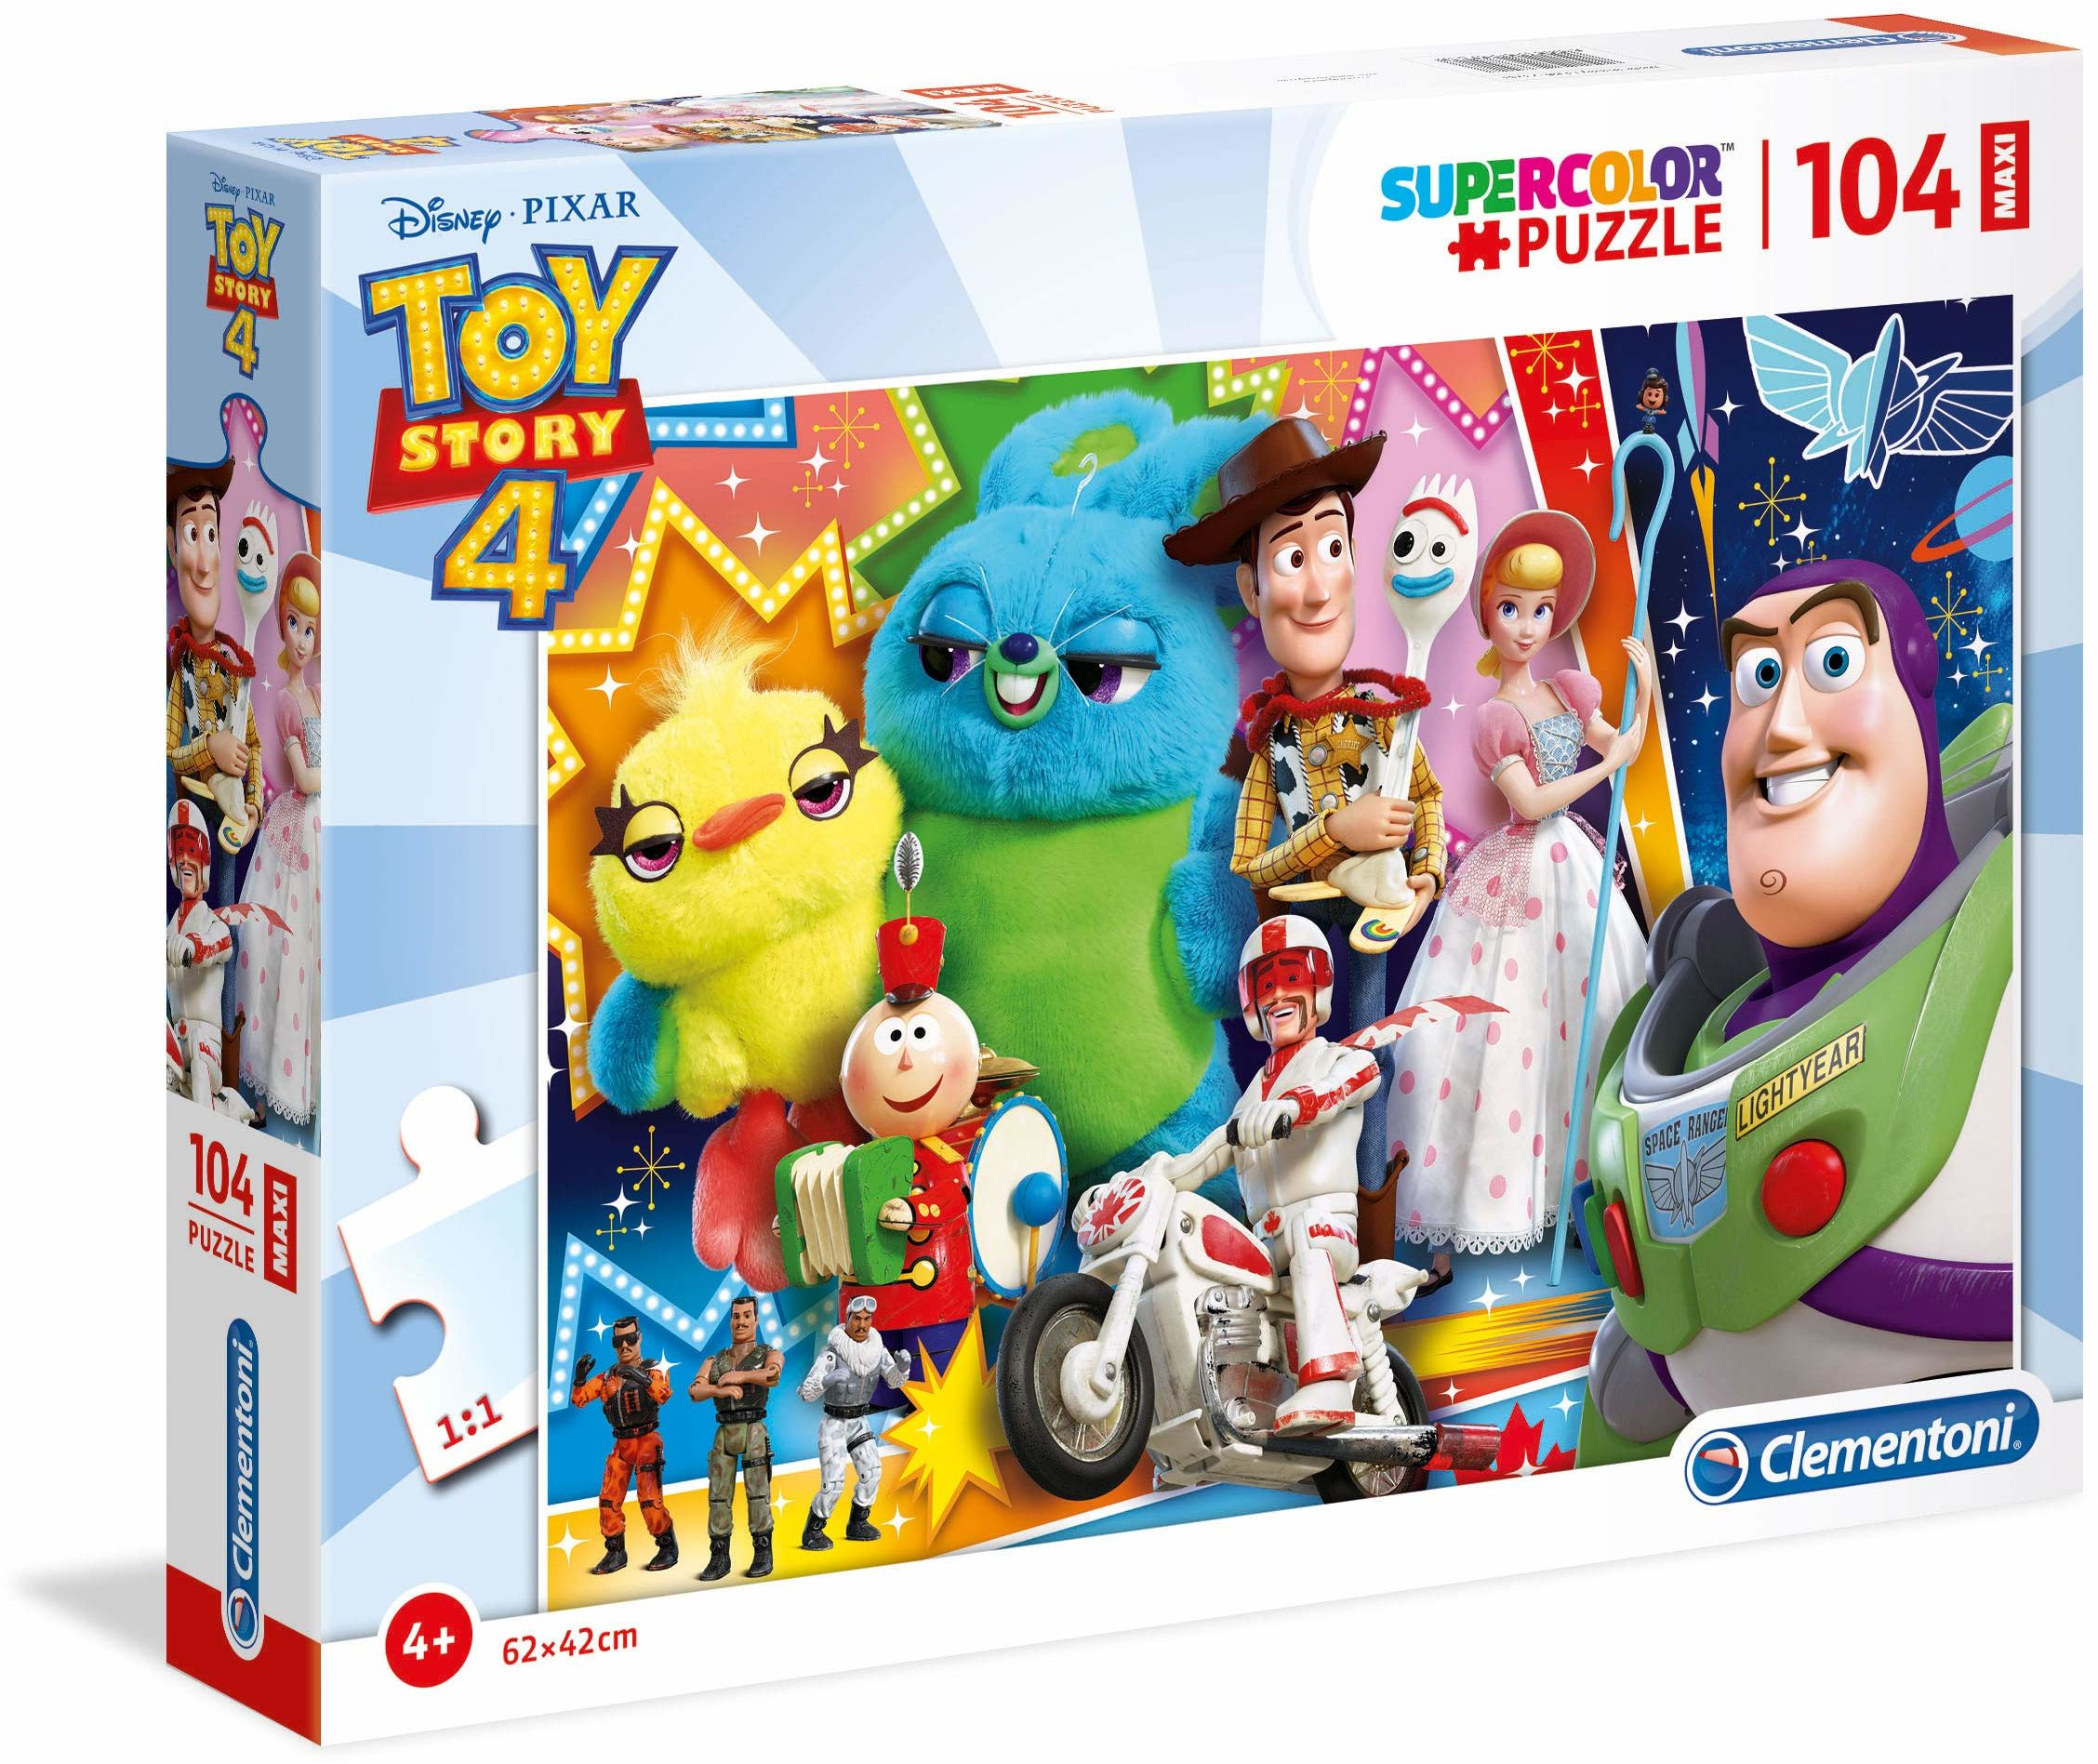 Clementoni 23741 104 szt. Maxi Puzzle Toy Story 4, wielokolorowe